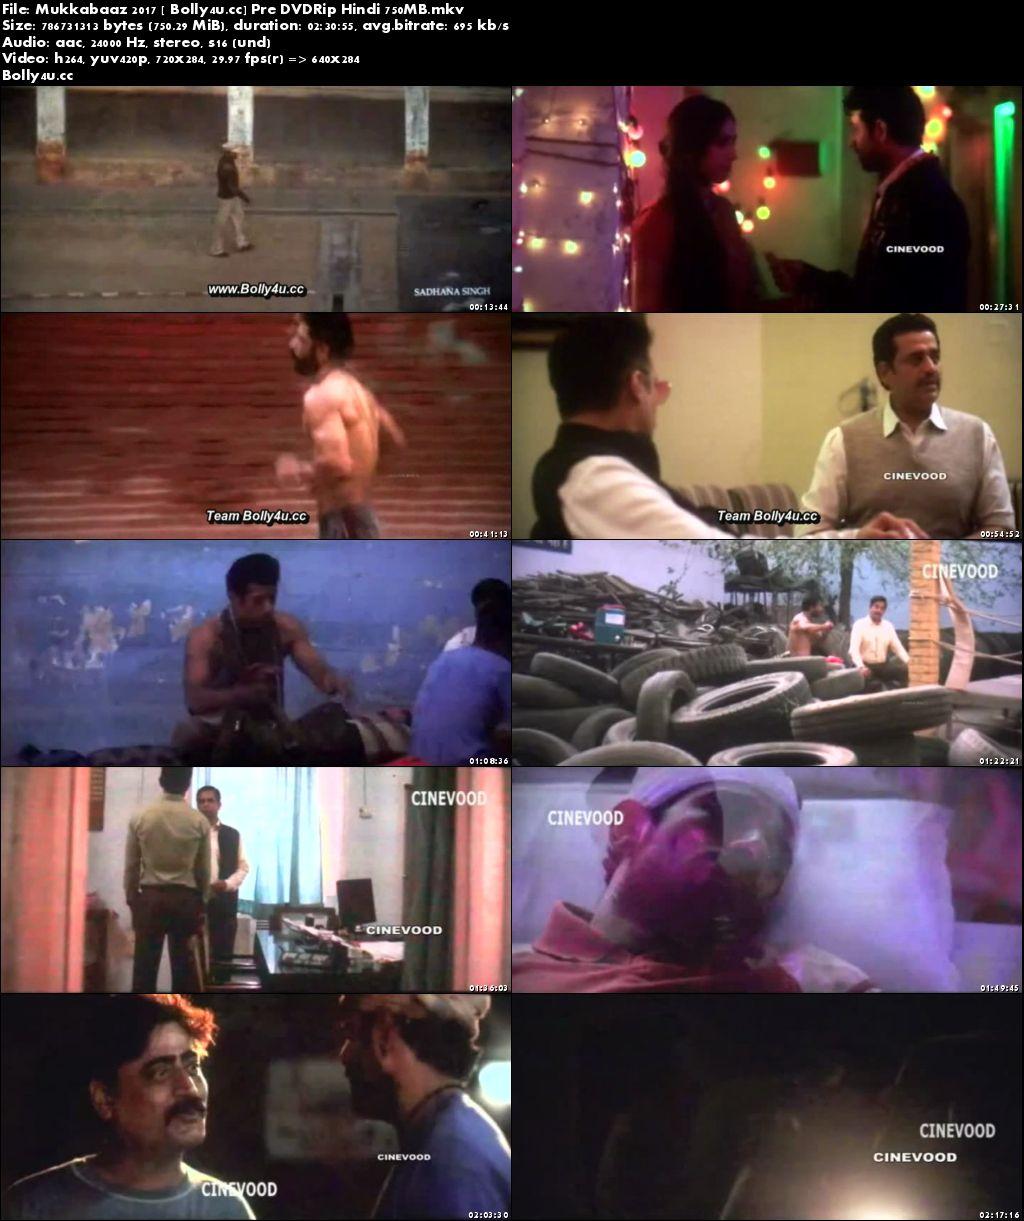 Mukkabaaz 2017 Pre DVDRip Full Hindi Movie Download x264